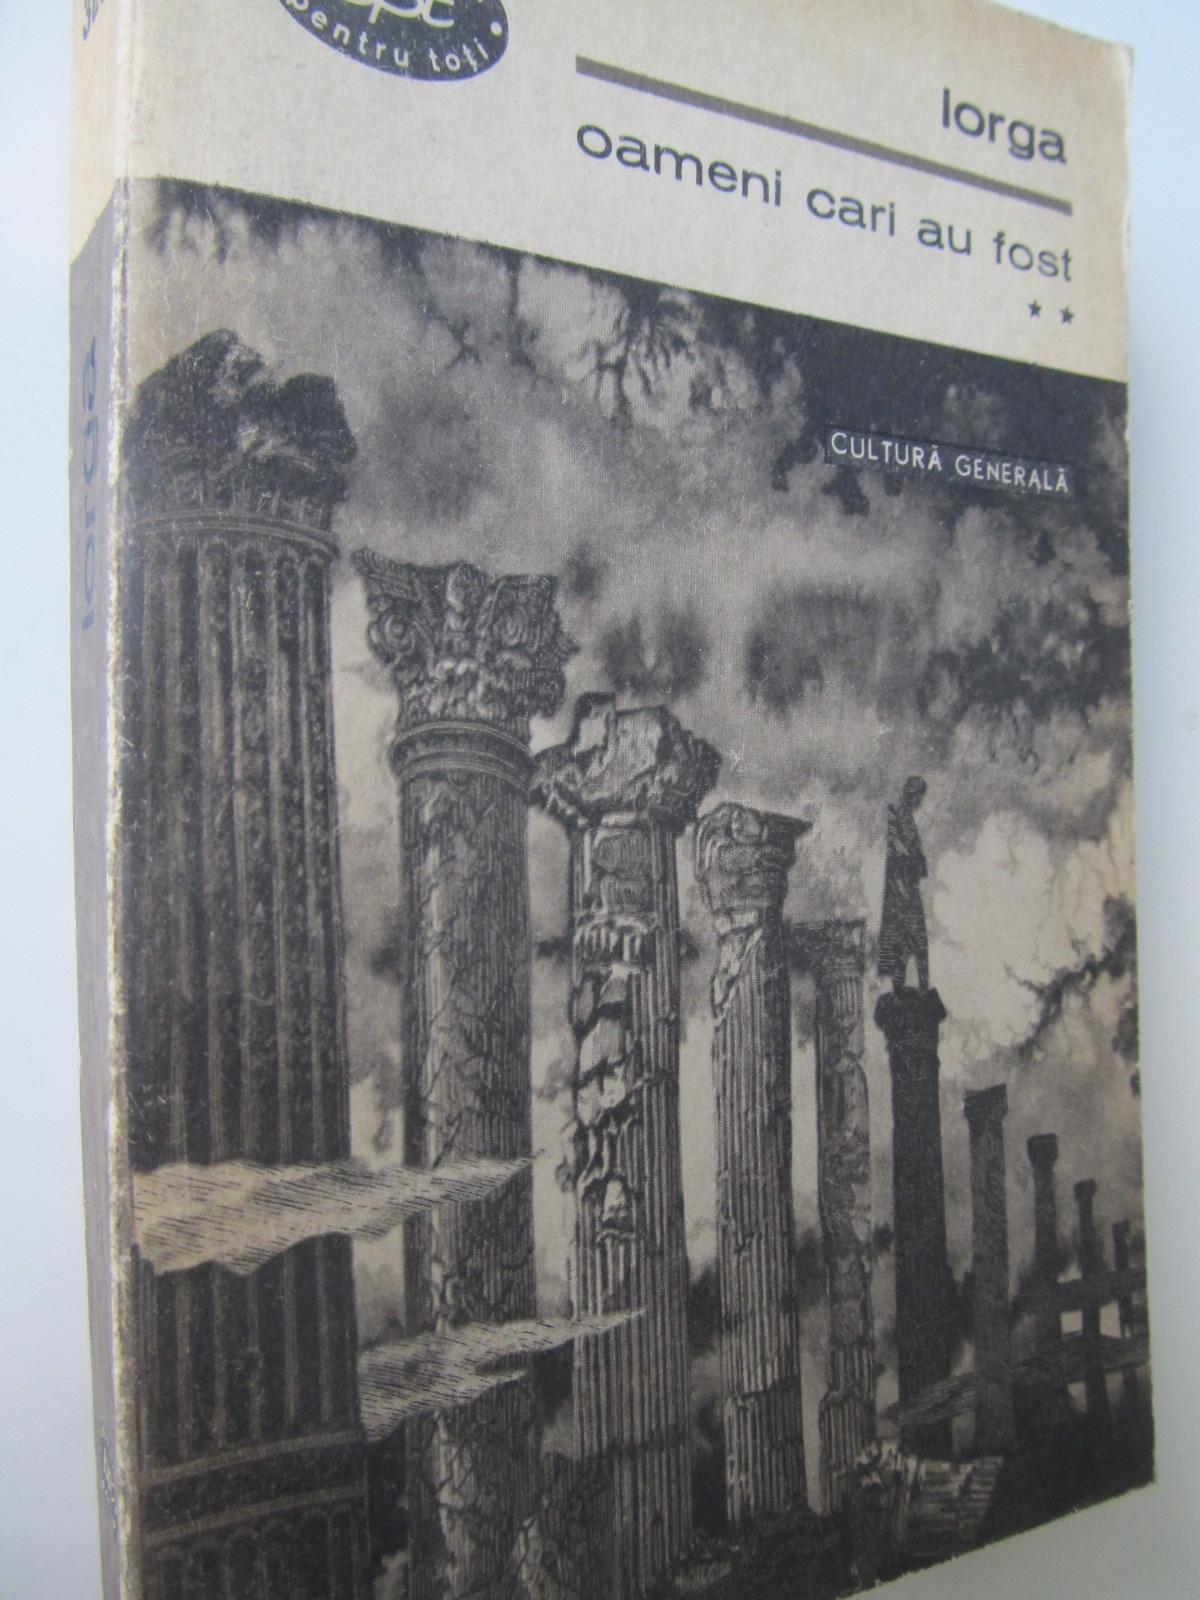 Oameni cari au fost (vol. 2) - N. Iorga | Detalii carte